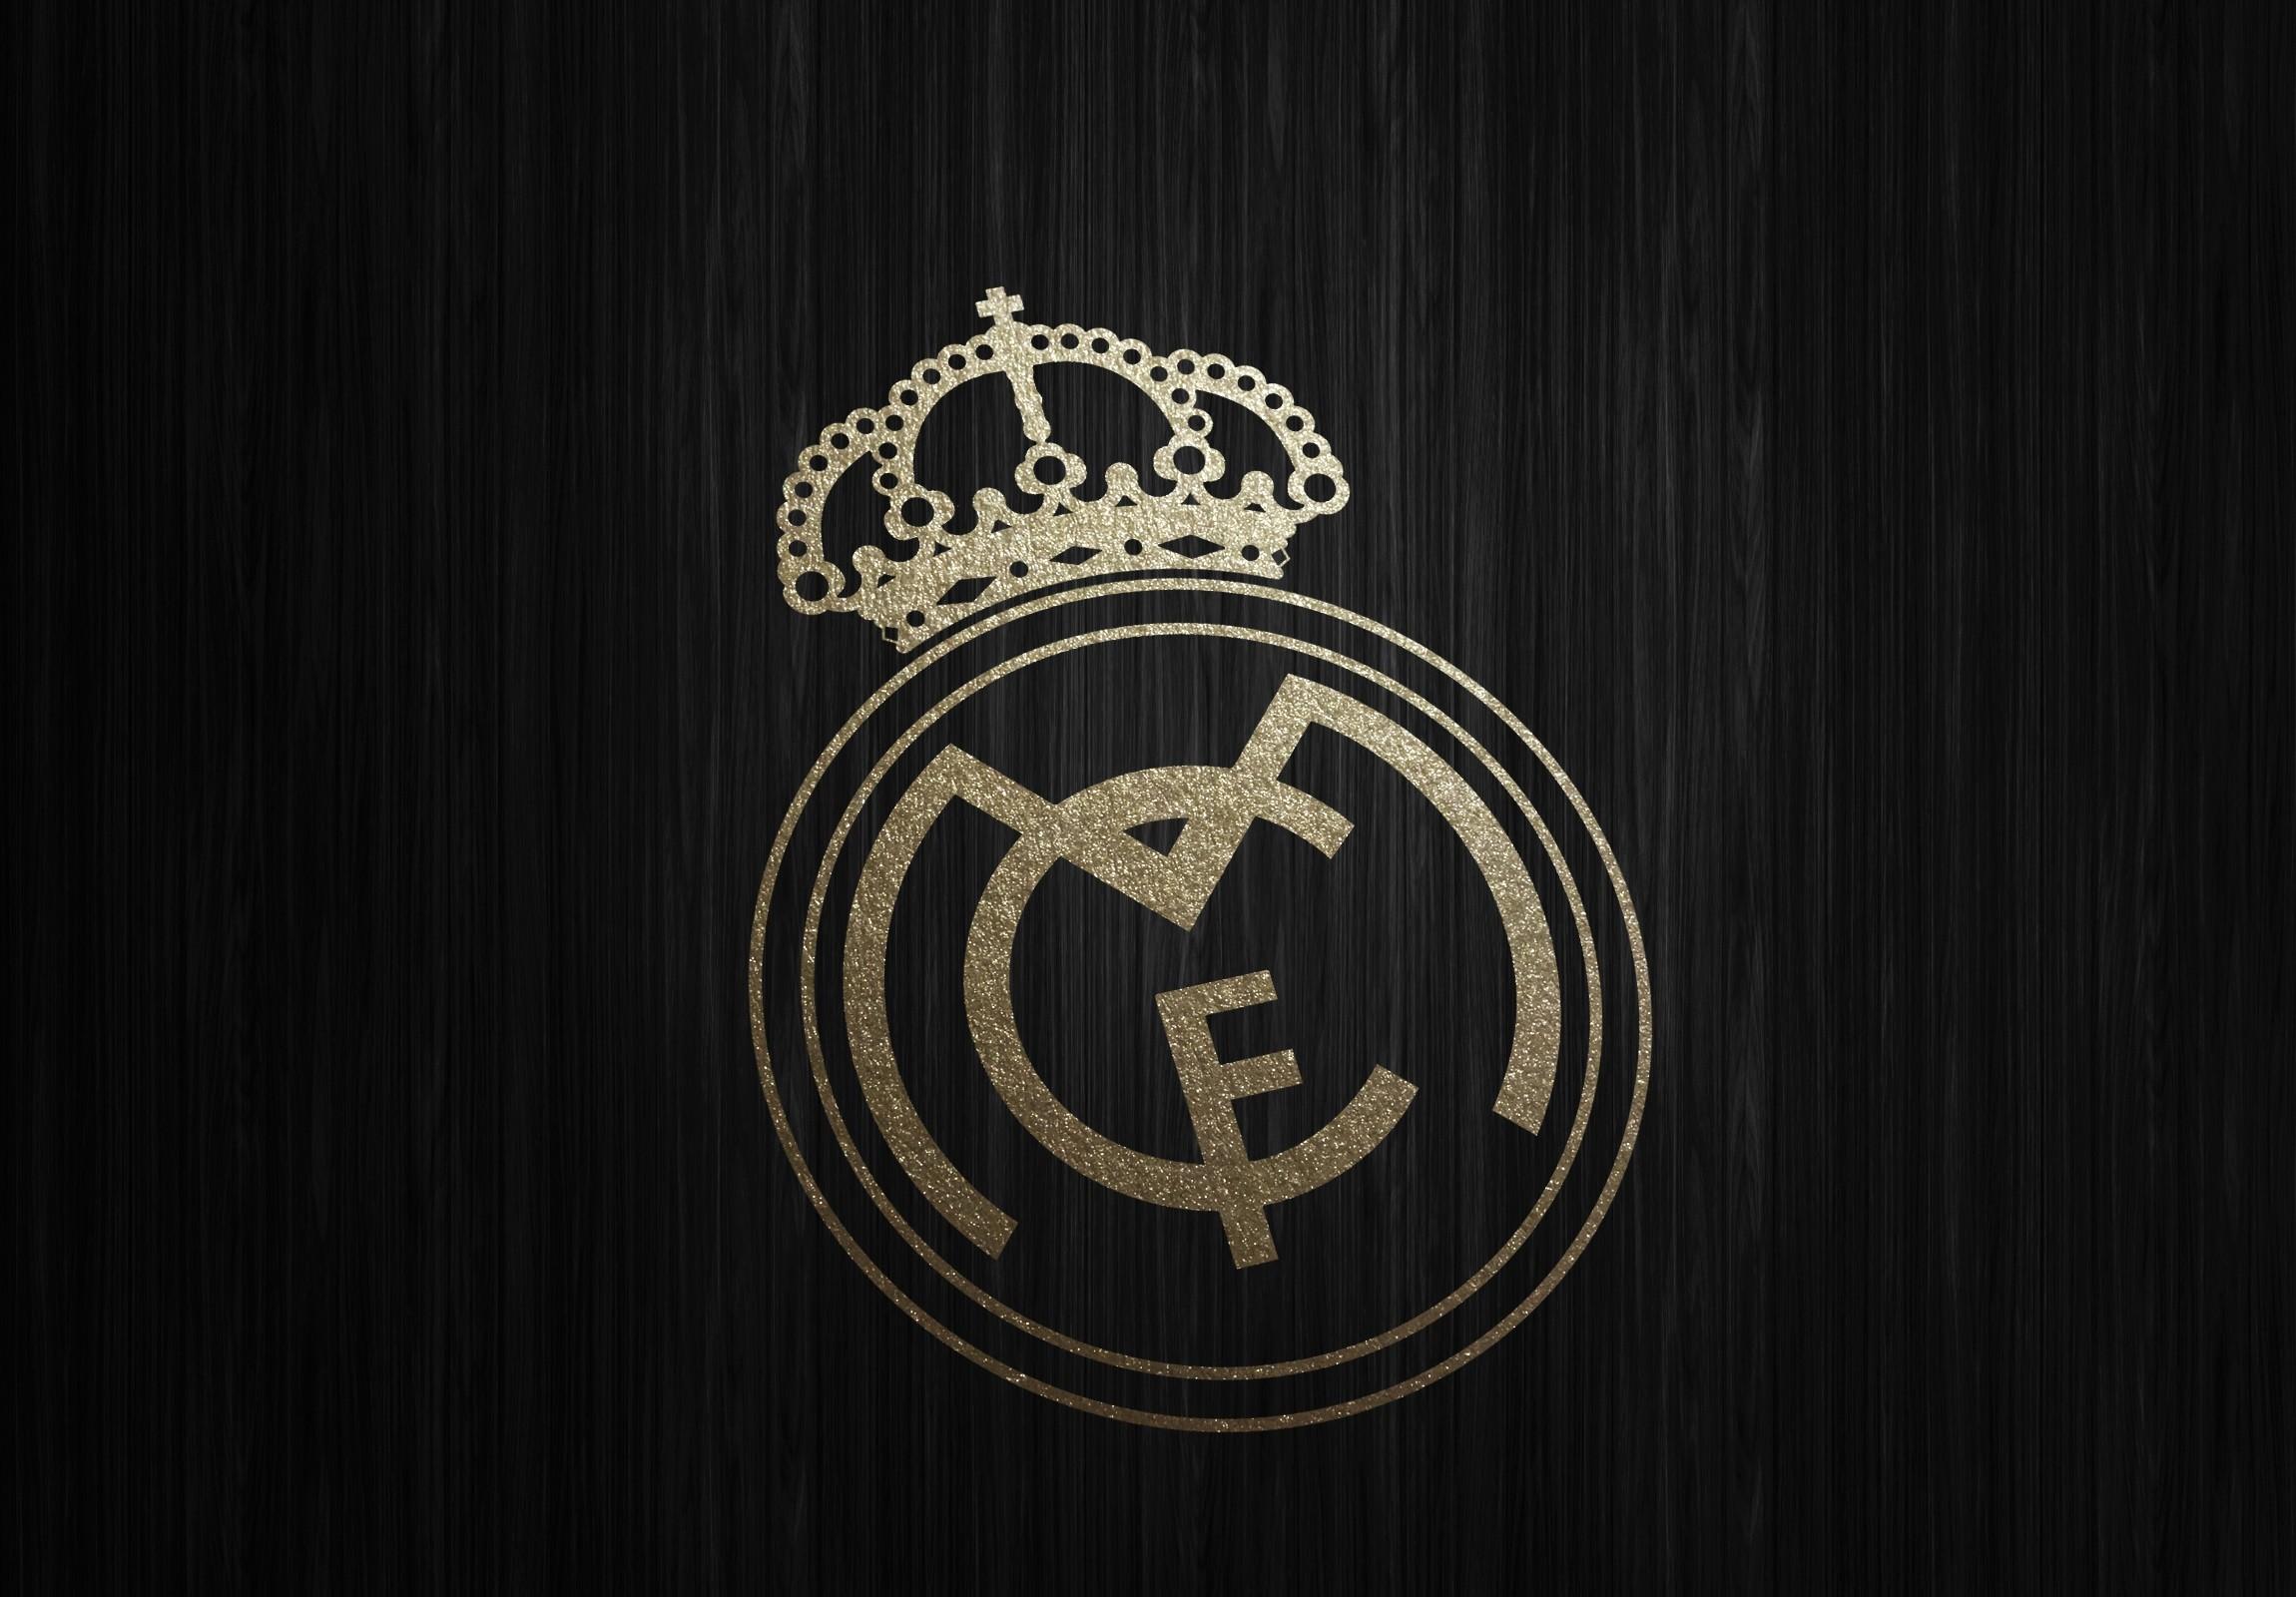 Most Inspiring Wallpaper Logo Real Madrid - 274076  Perfect Image Reference_297235.jpg